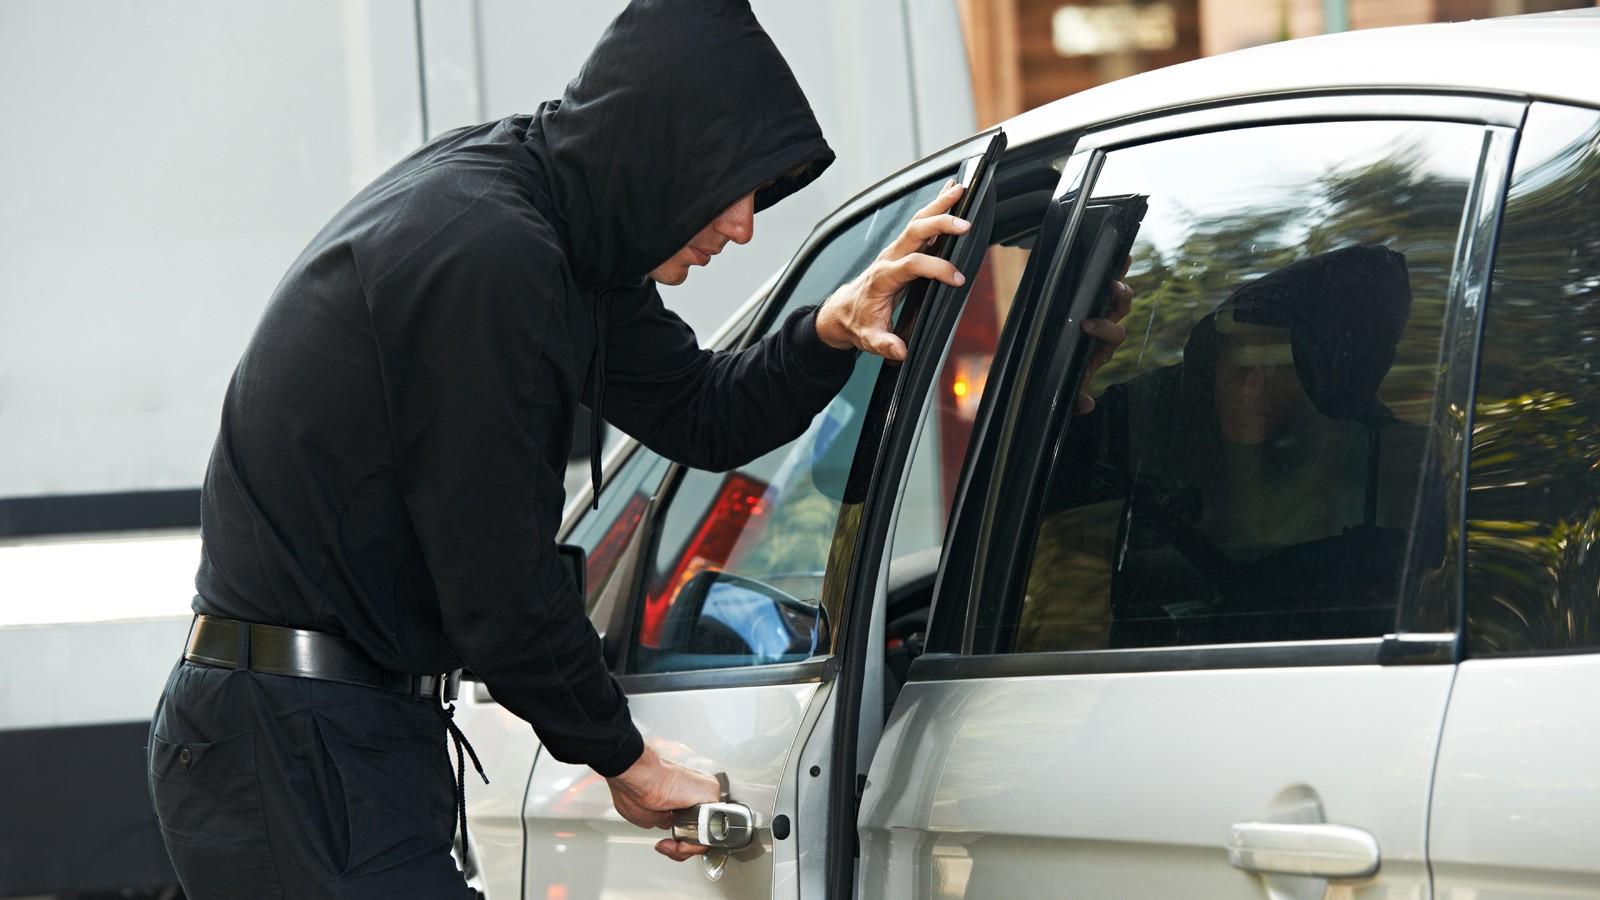 thief burglar at automobile car stealing